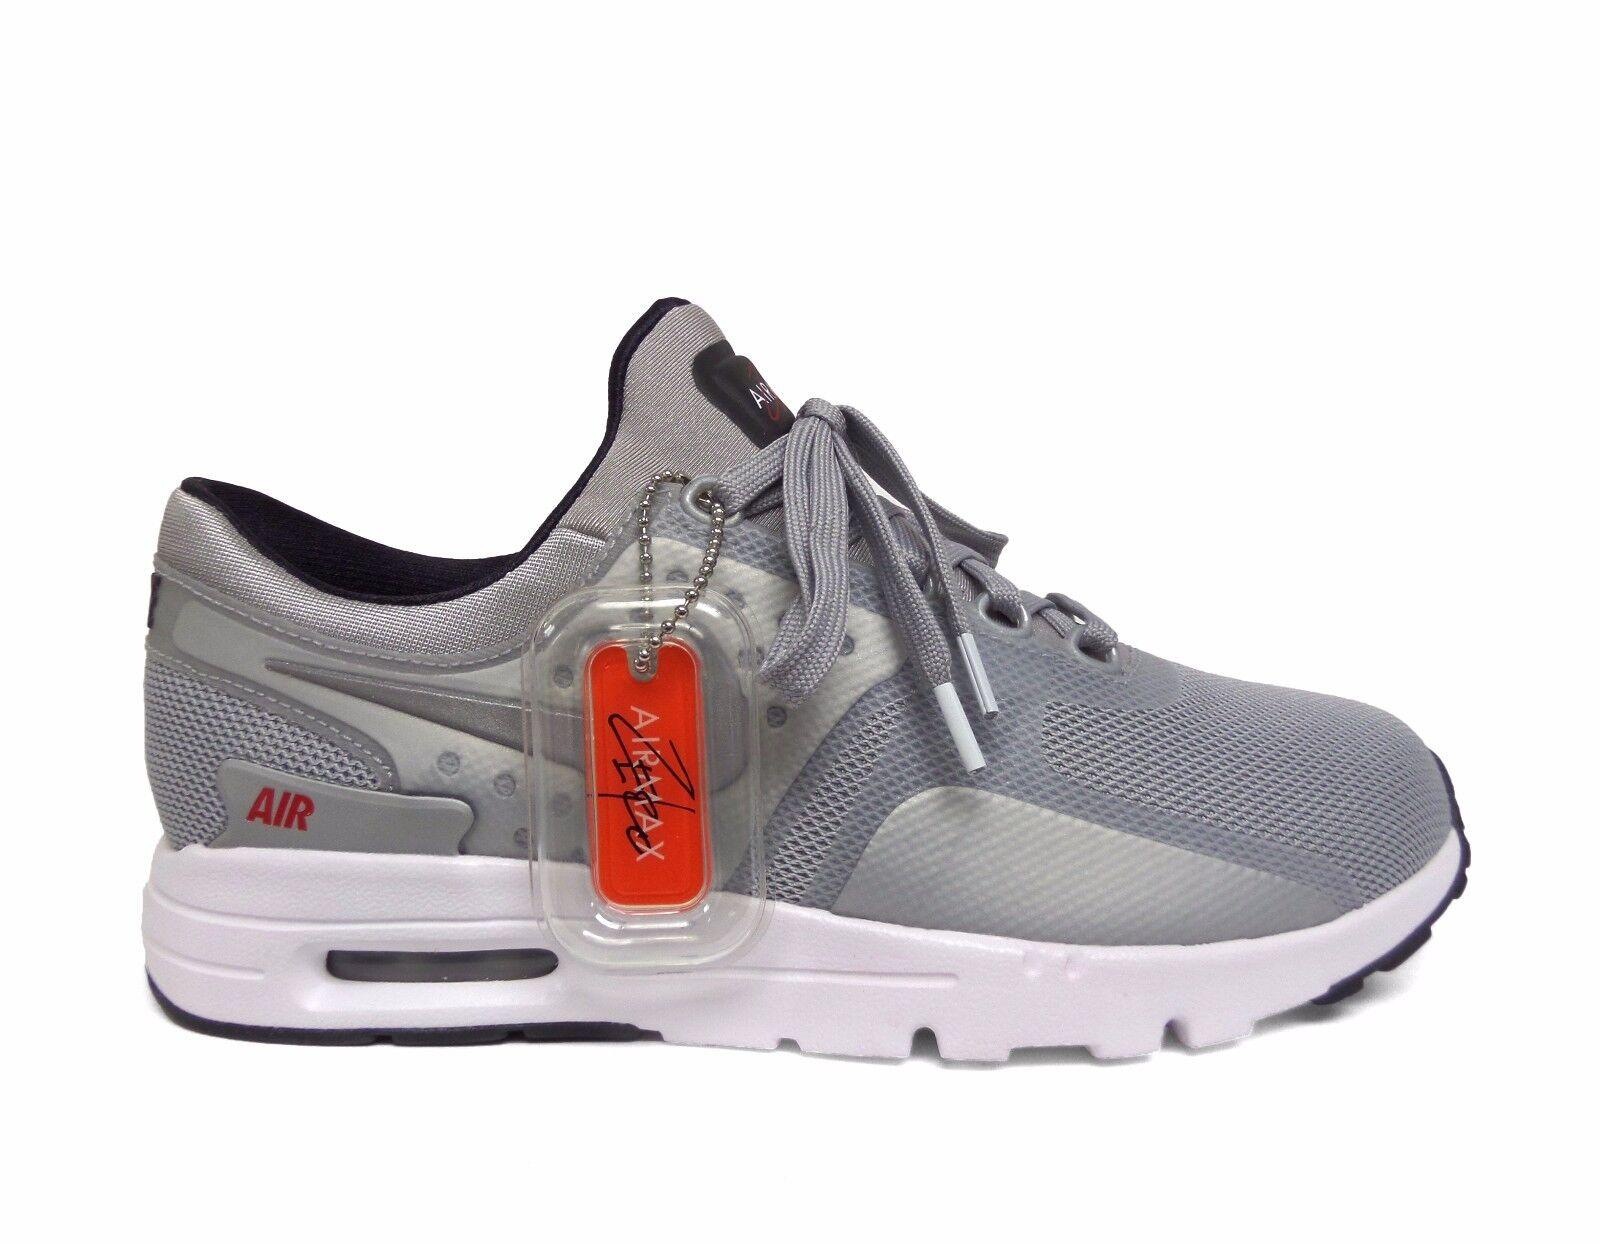 cheap for discount a41f0 1eea9 Nike Women s AIR MAX ZERO QS Training Shoes Shoes Shoes Metallic Silver  863700-002 b